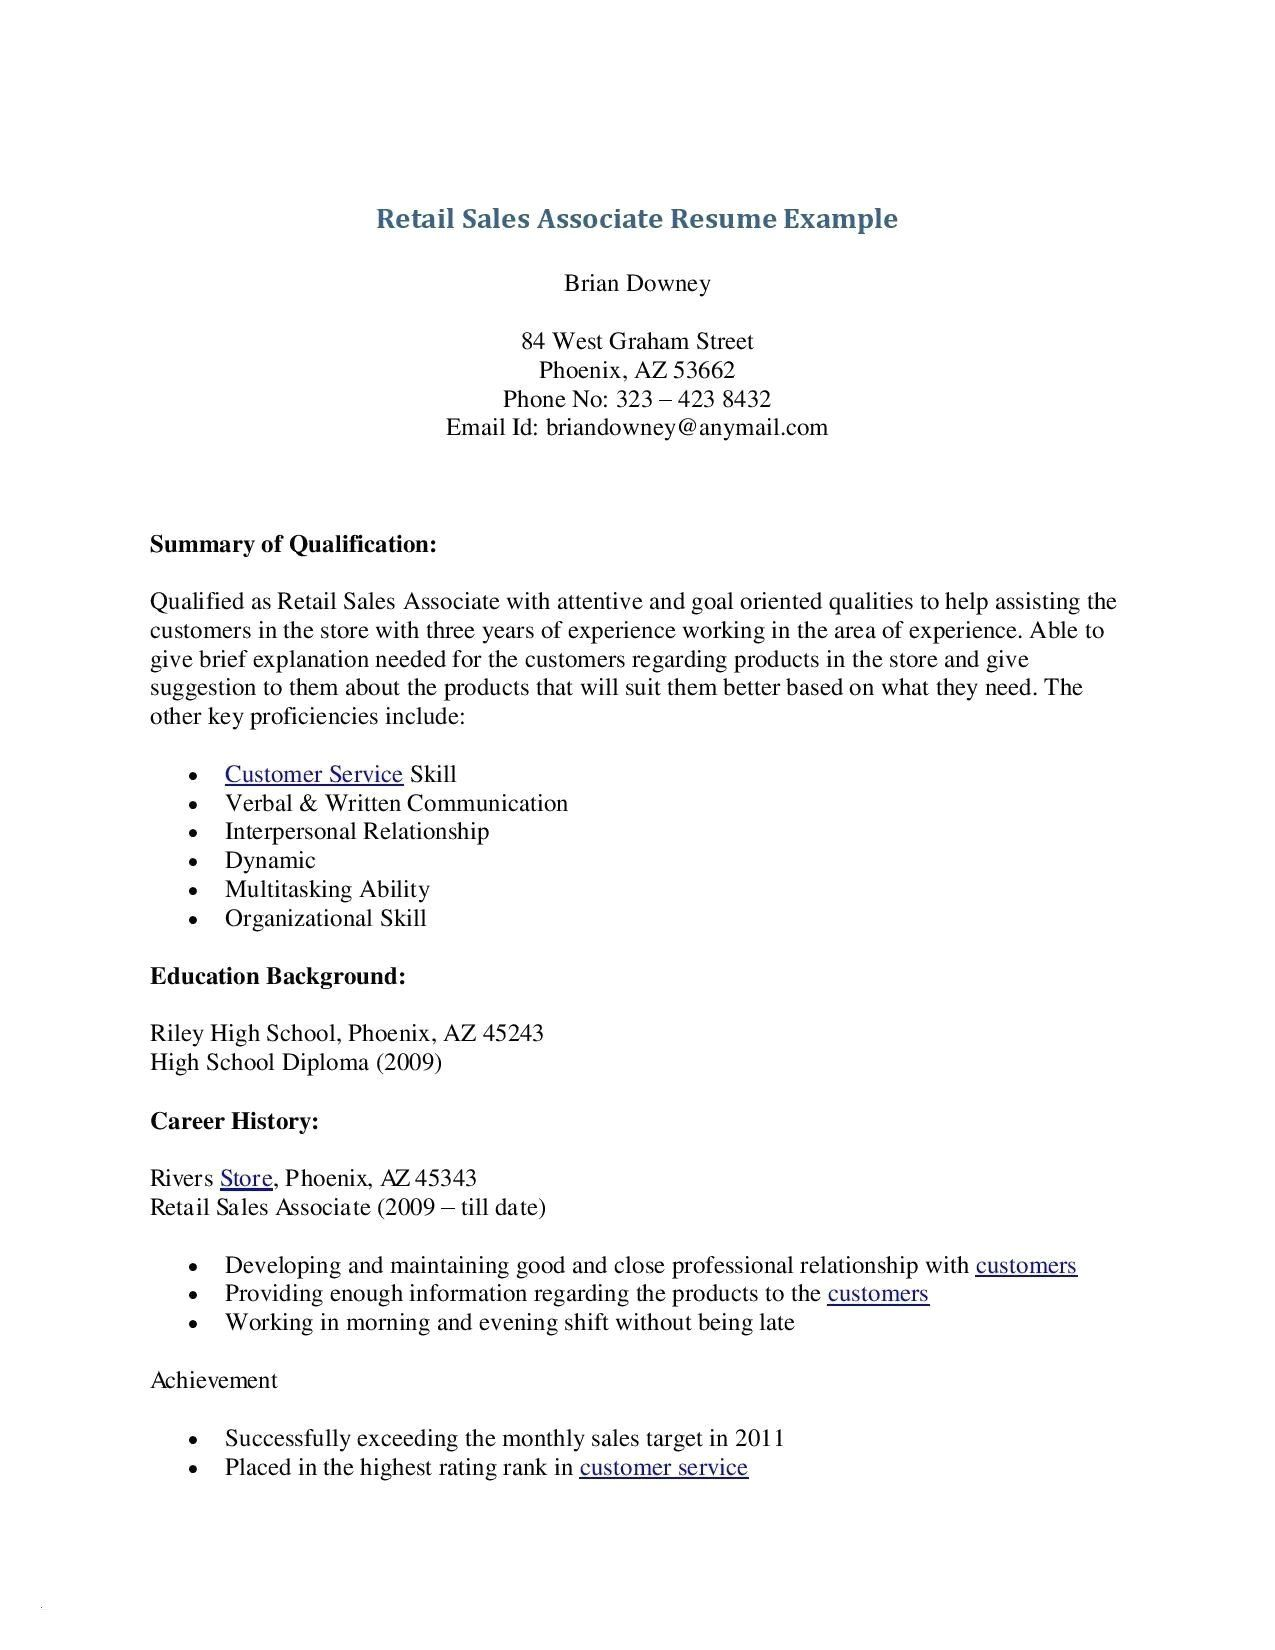 Sales Associate Resume Description 9 Retail Resume No Experience Sample Samples Resume Examples Resume Skills Resume No Experience